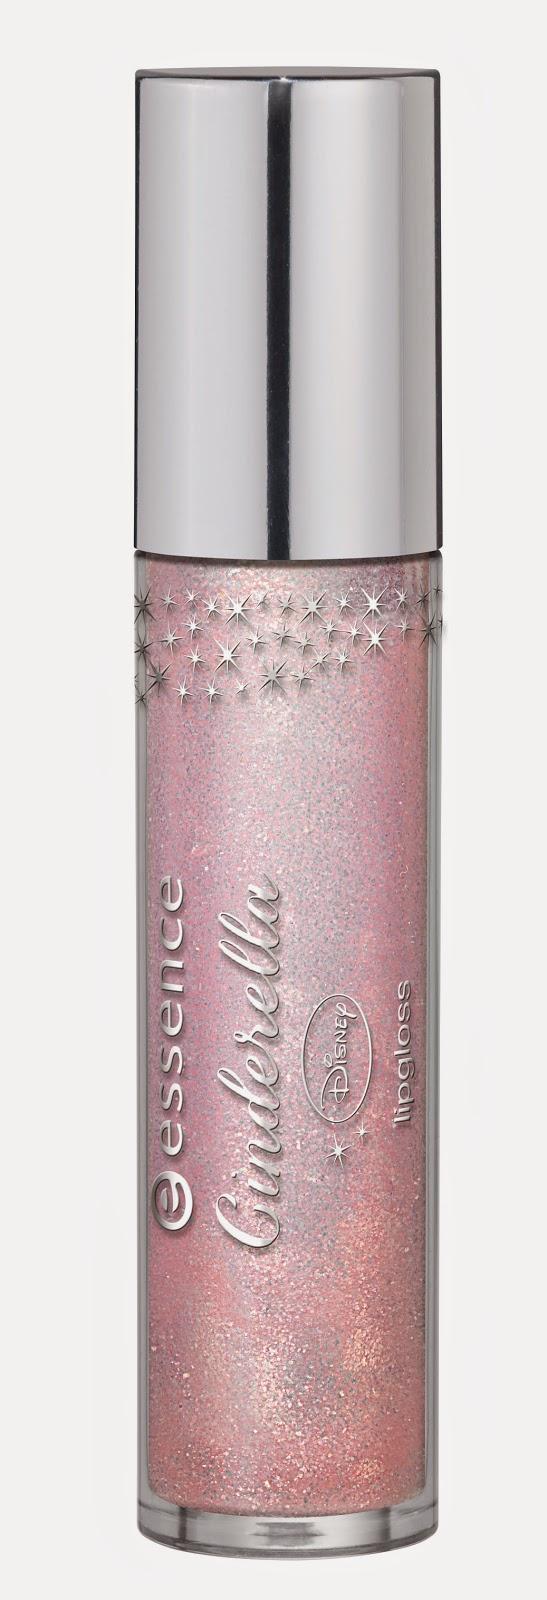 essence cinderella – lipgloss - www.annitschkasblog.de